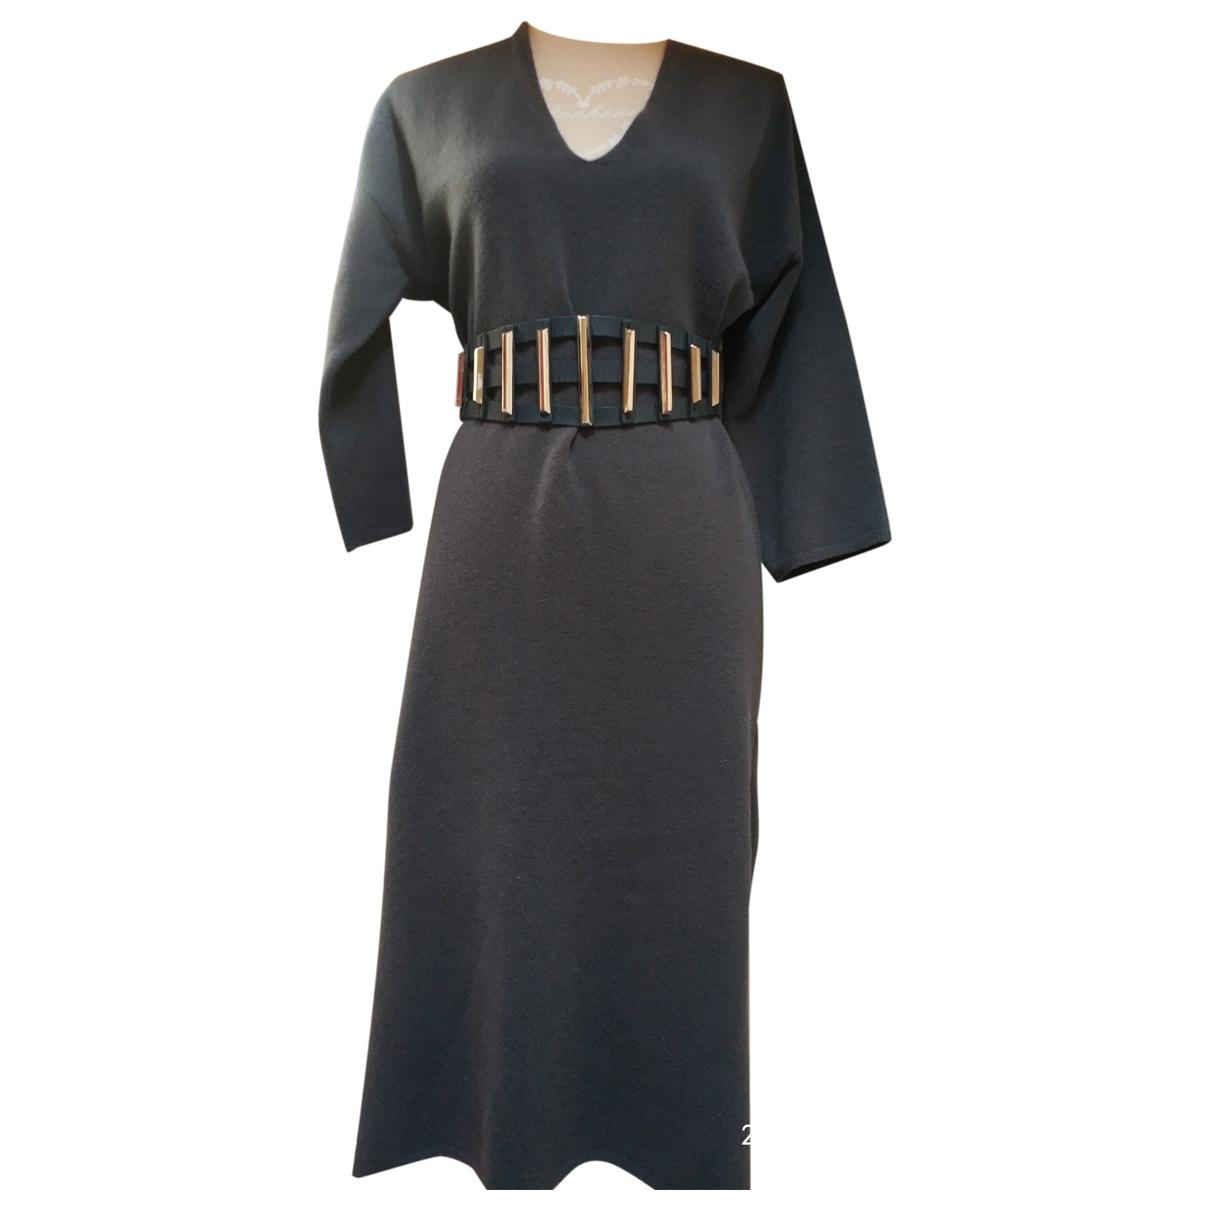 Massimo Dutti \N Grey Wool dress for Women M International